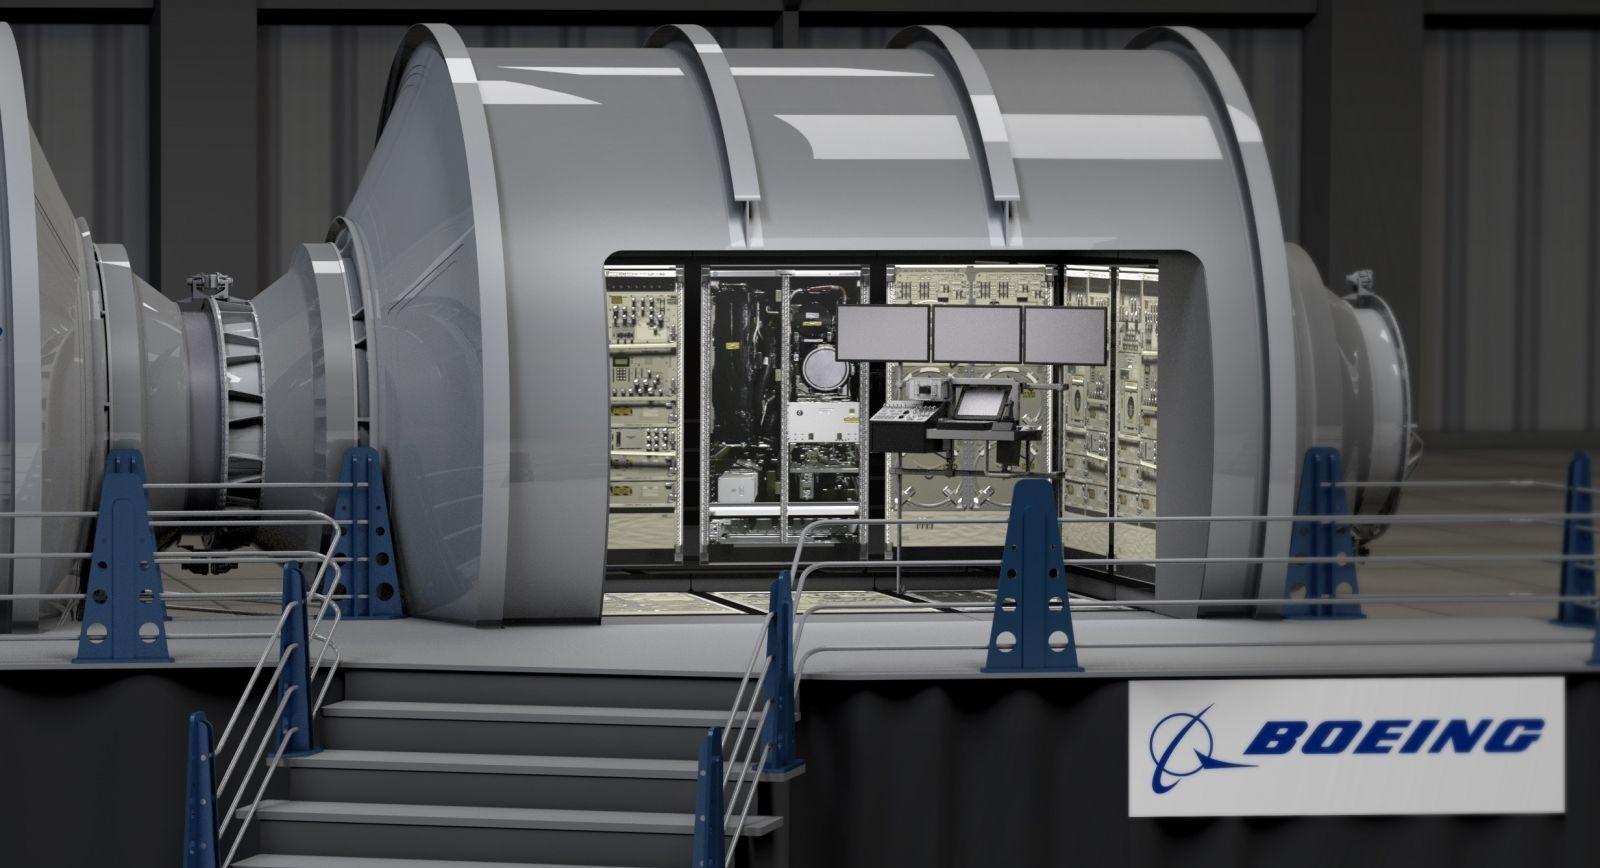 Boeing NextSTEP-2 demonstrator